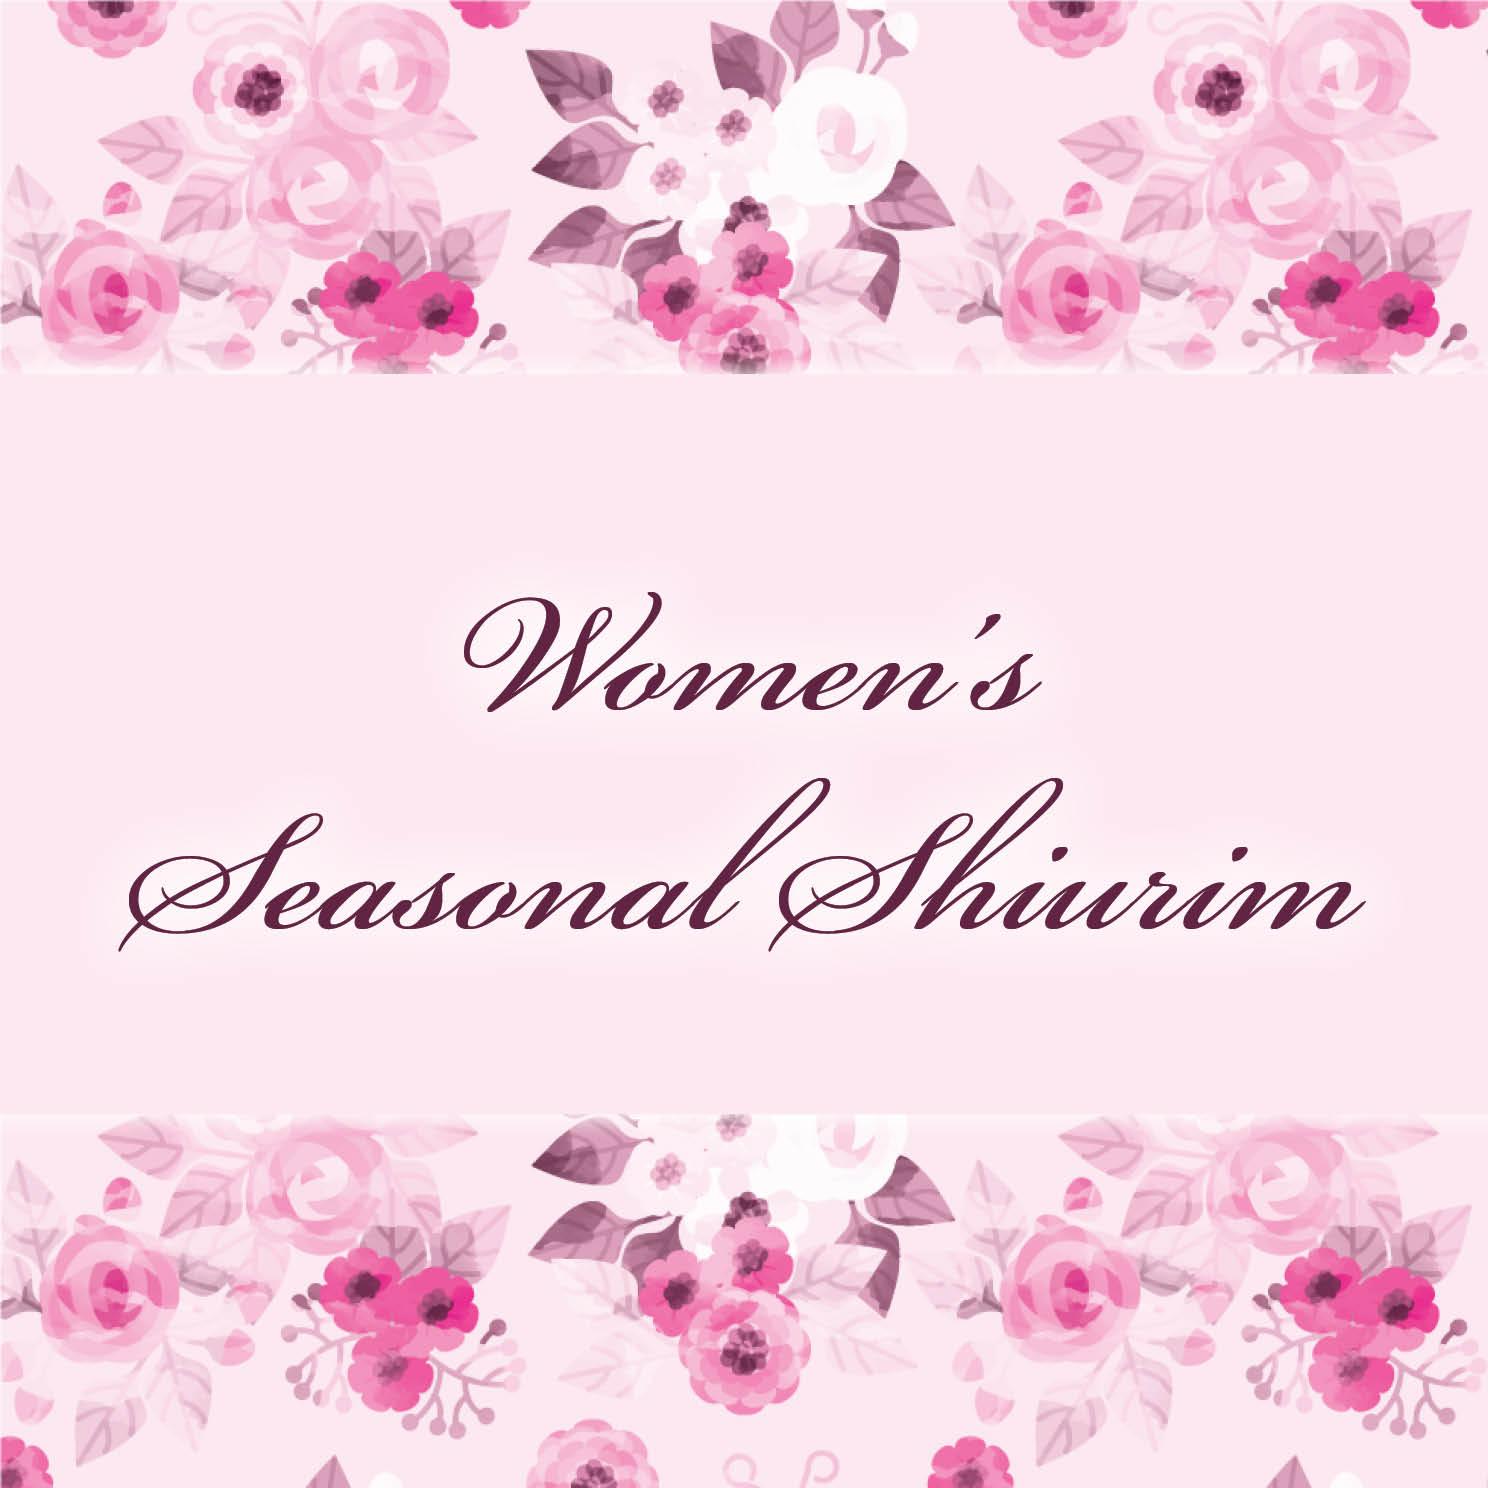 Women's seasonal Shiurim